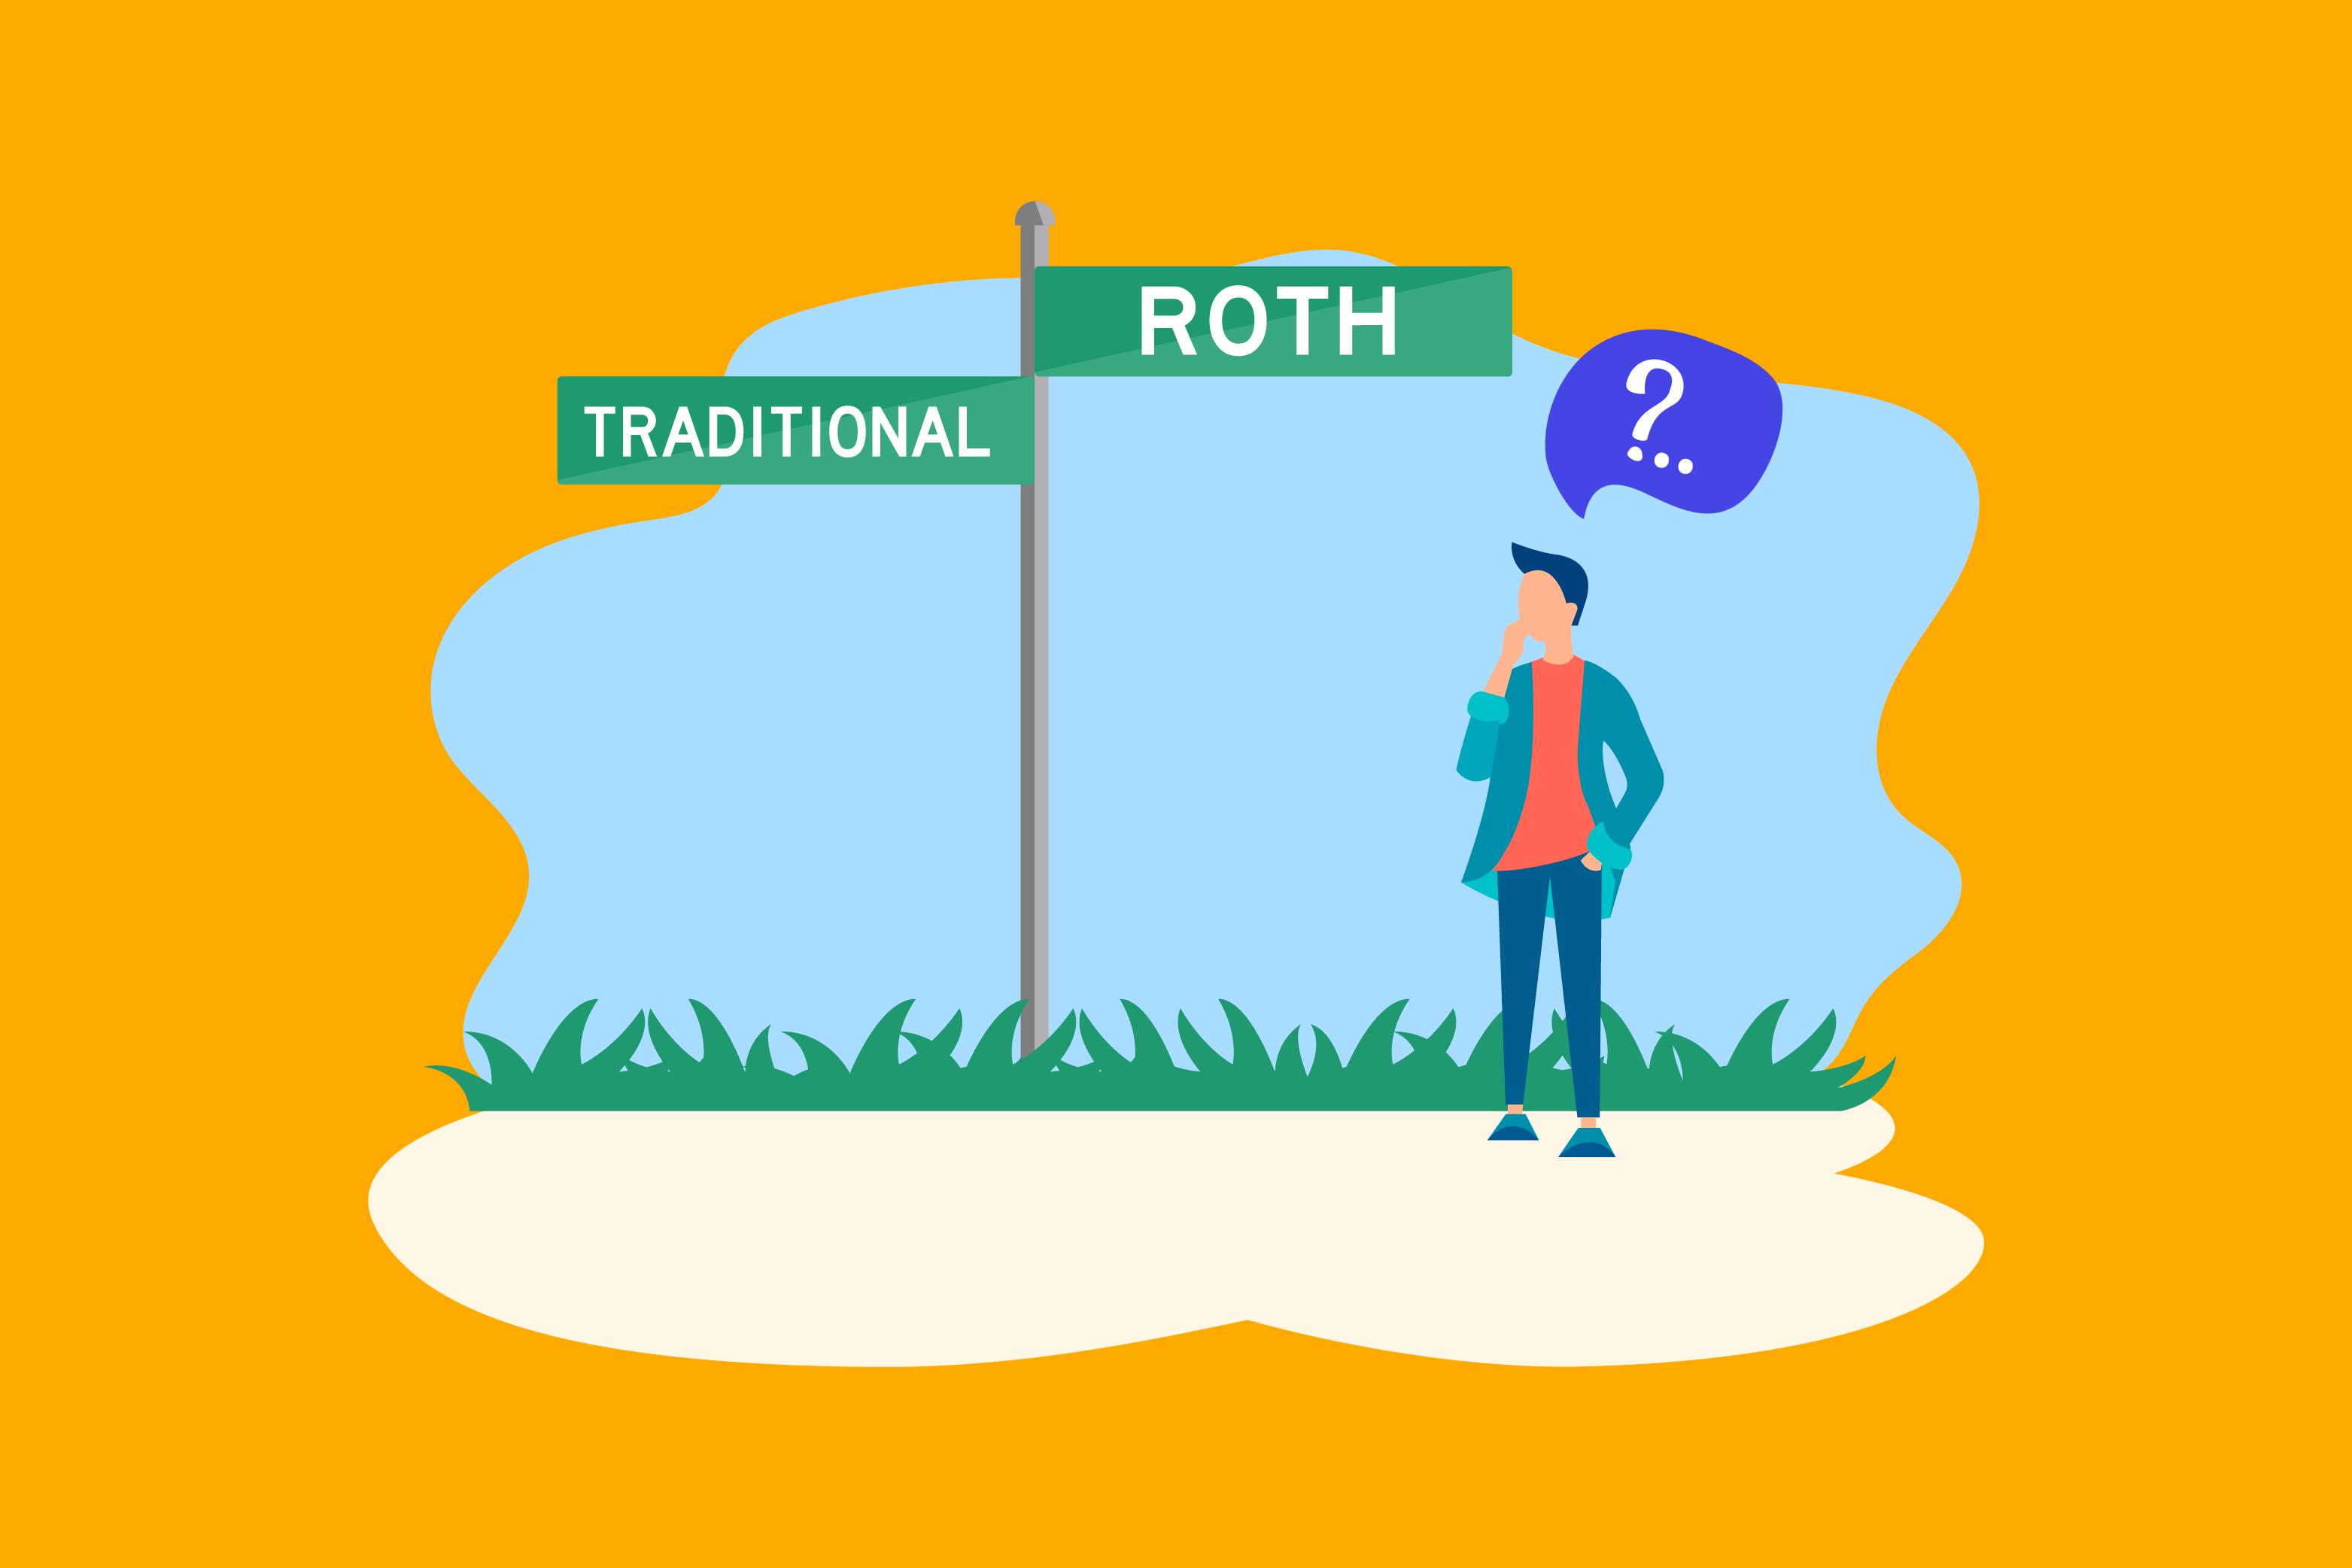 Roth Case Study